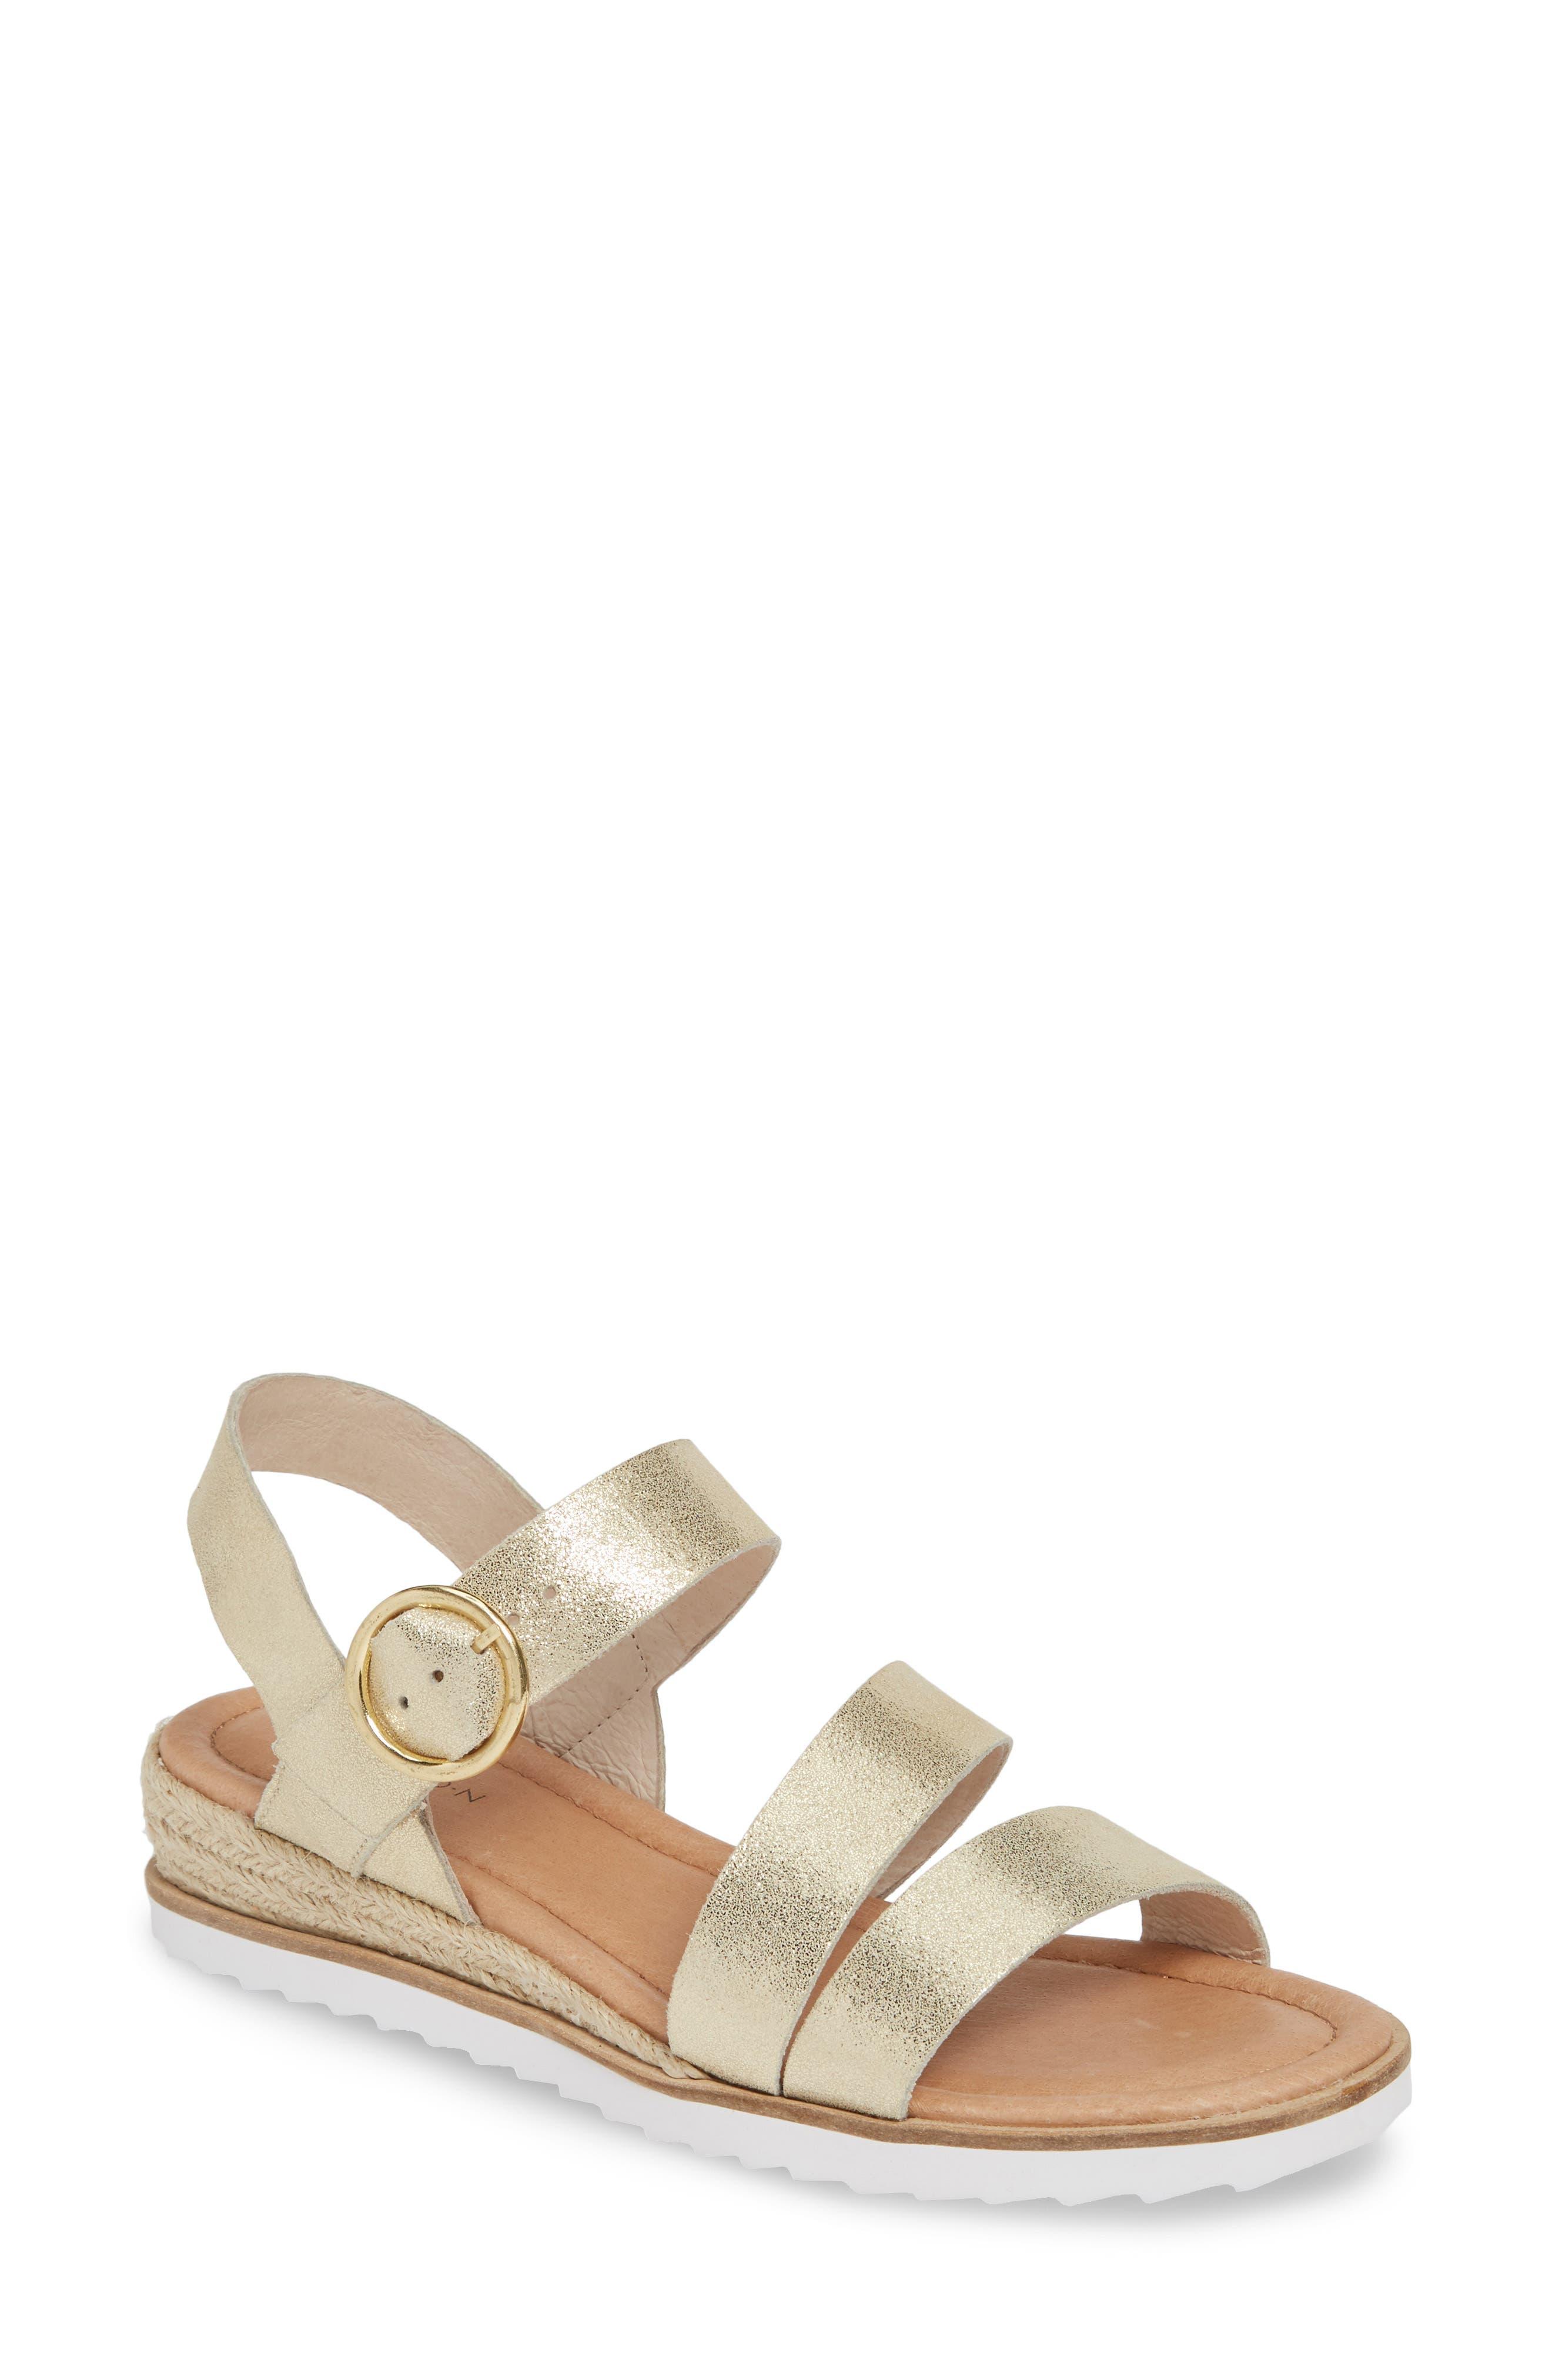 Caslon Cameron Espadrille Wedge Sandal (Women)